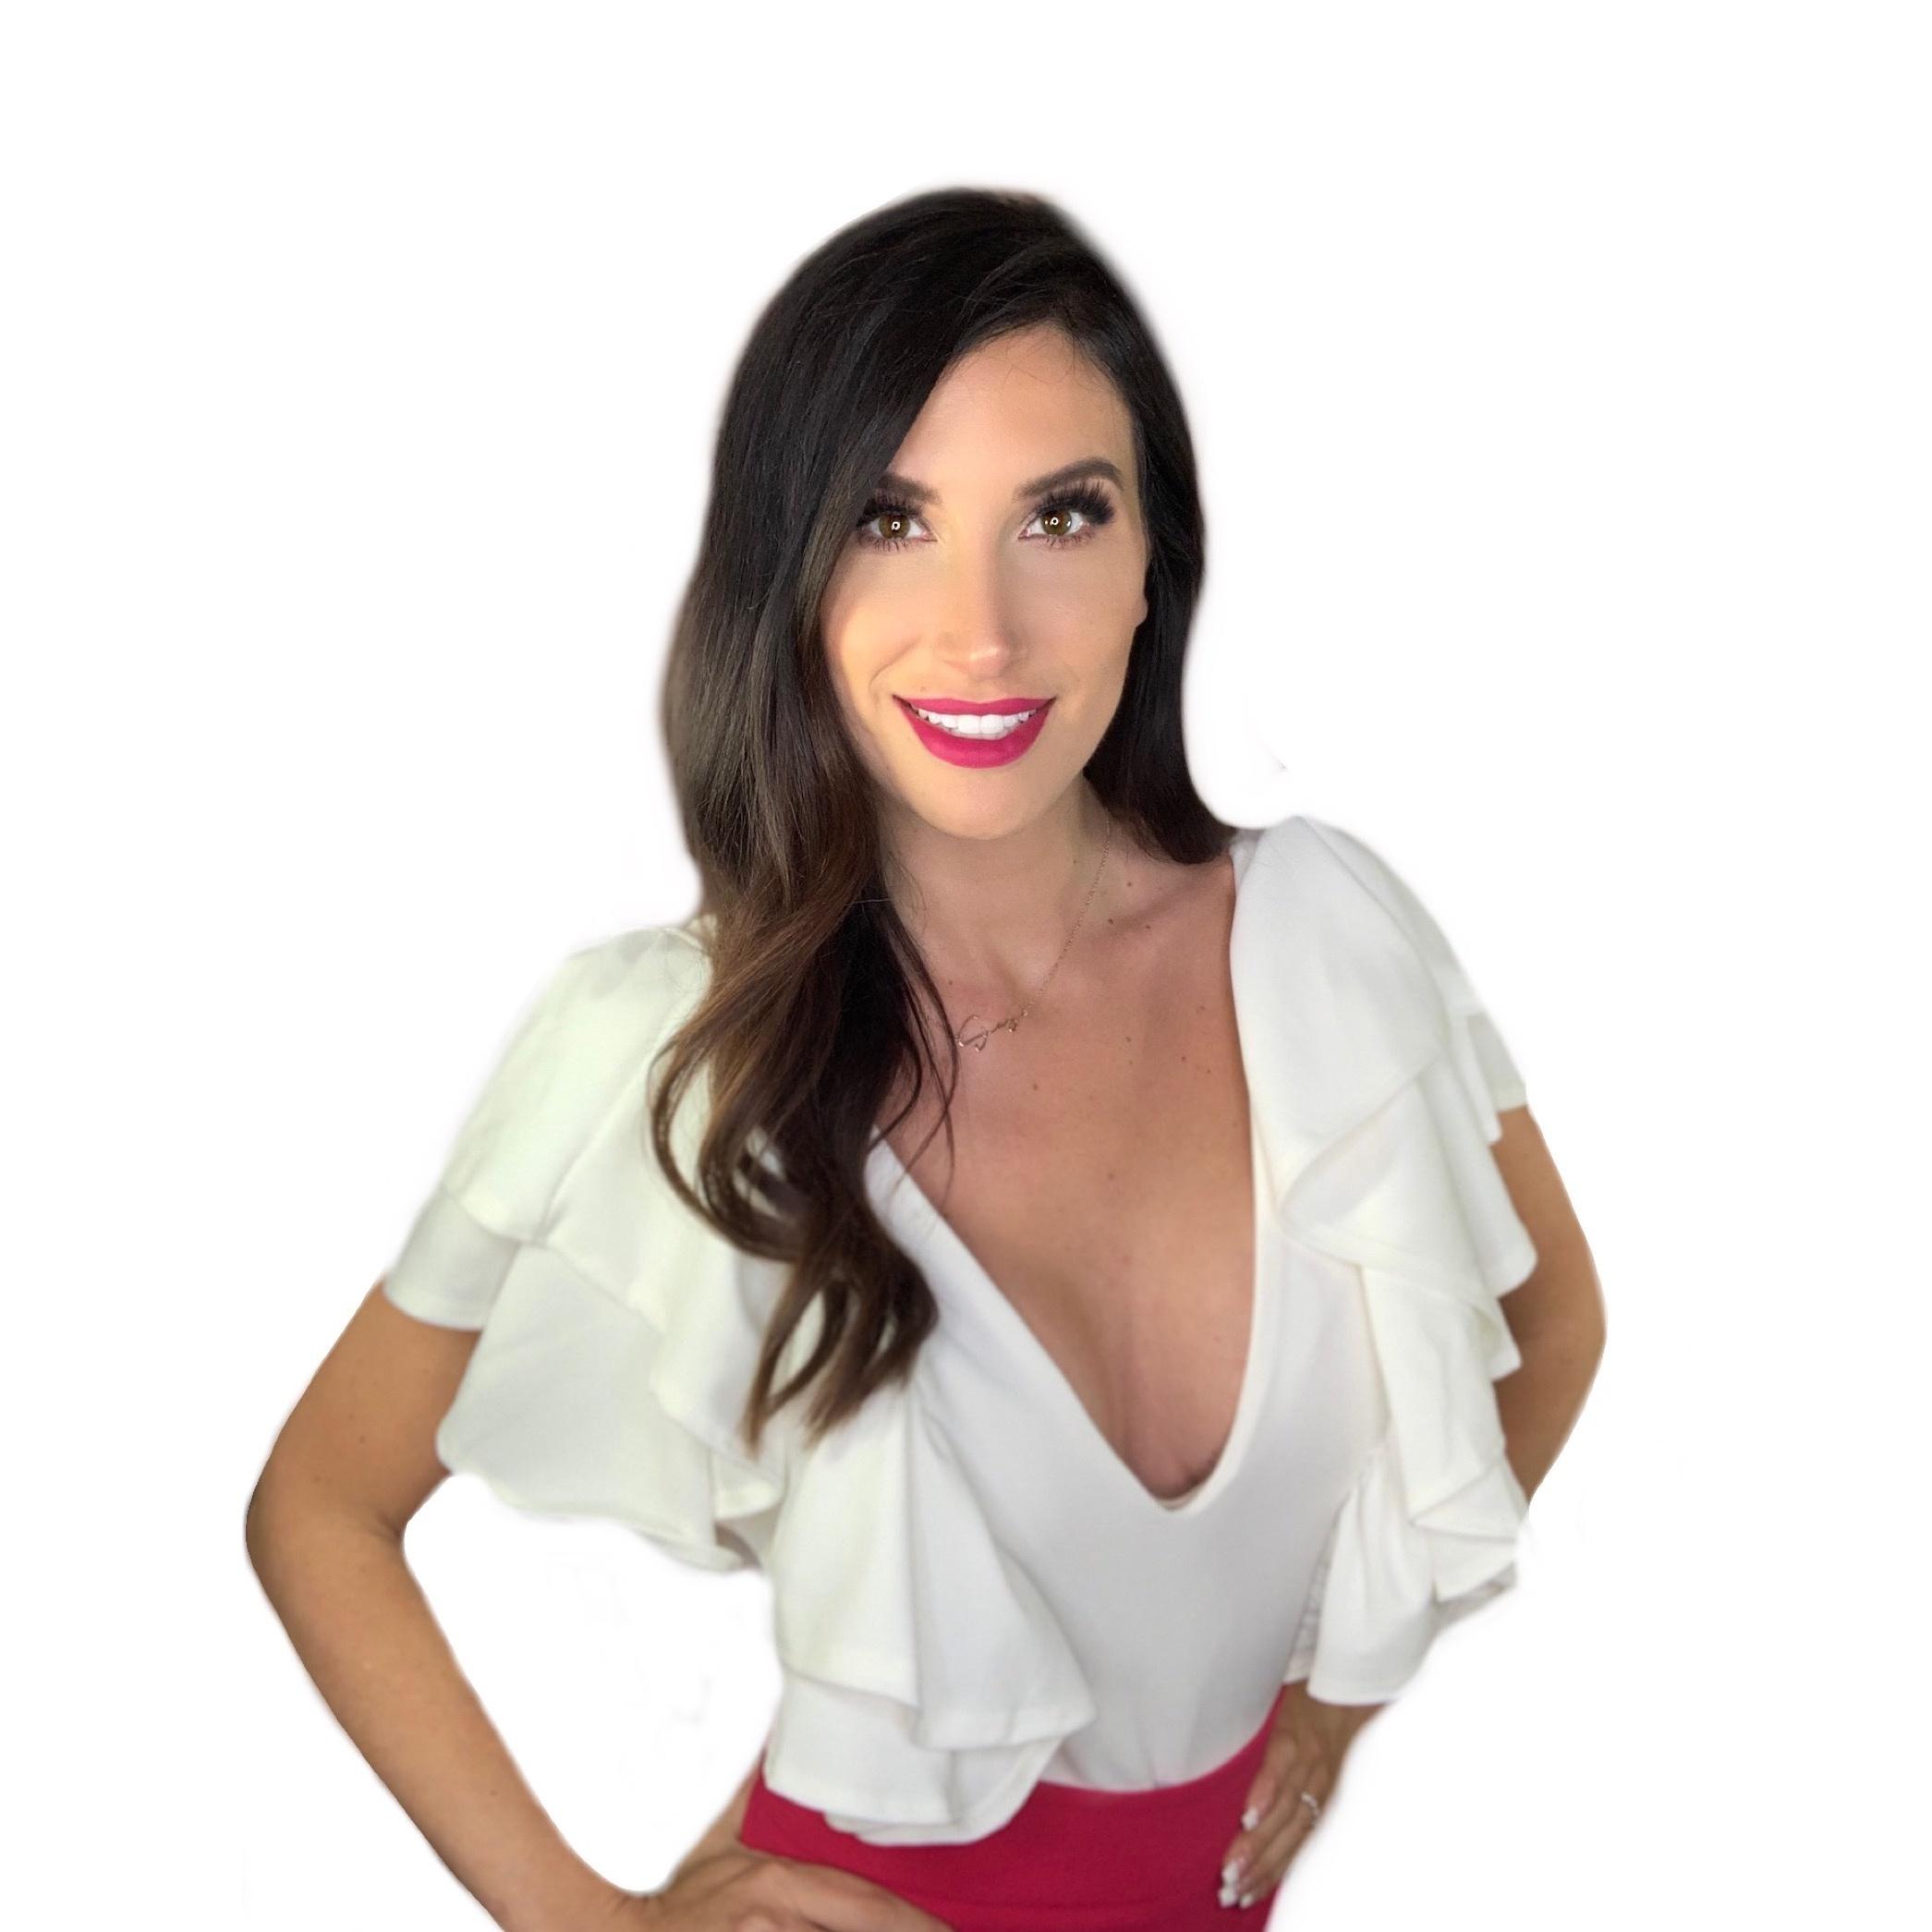 Shay Danielle